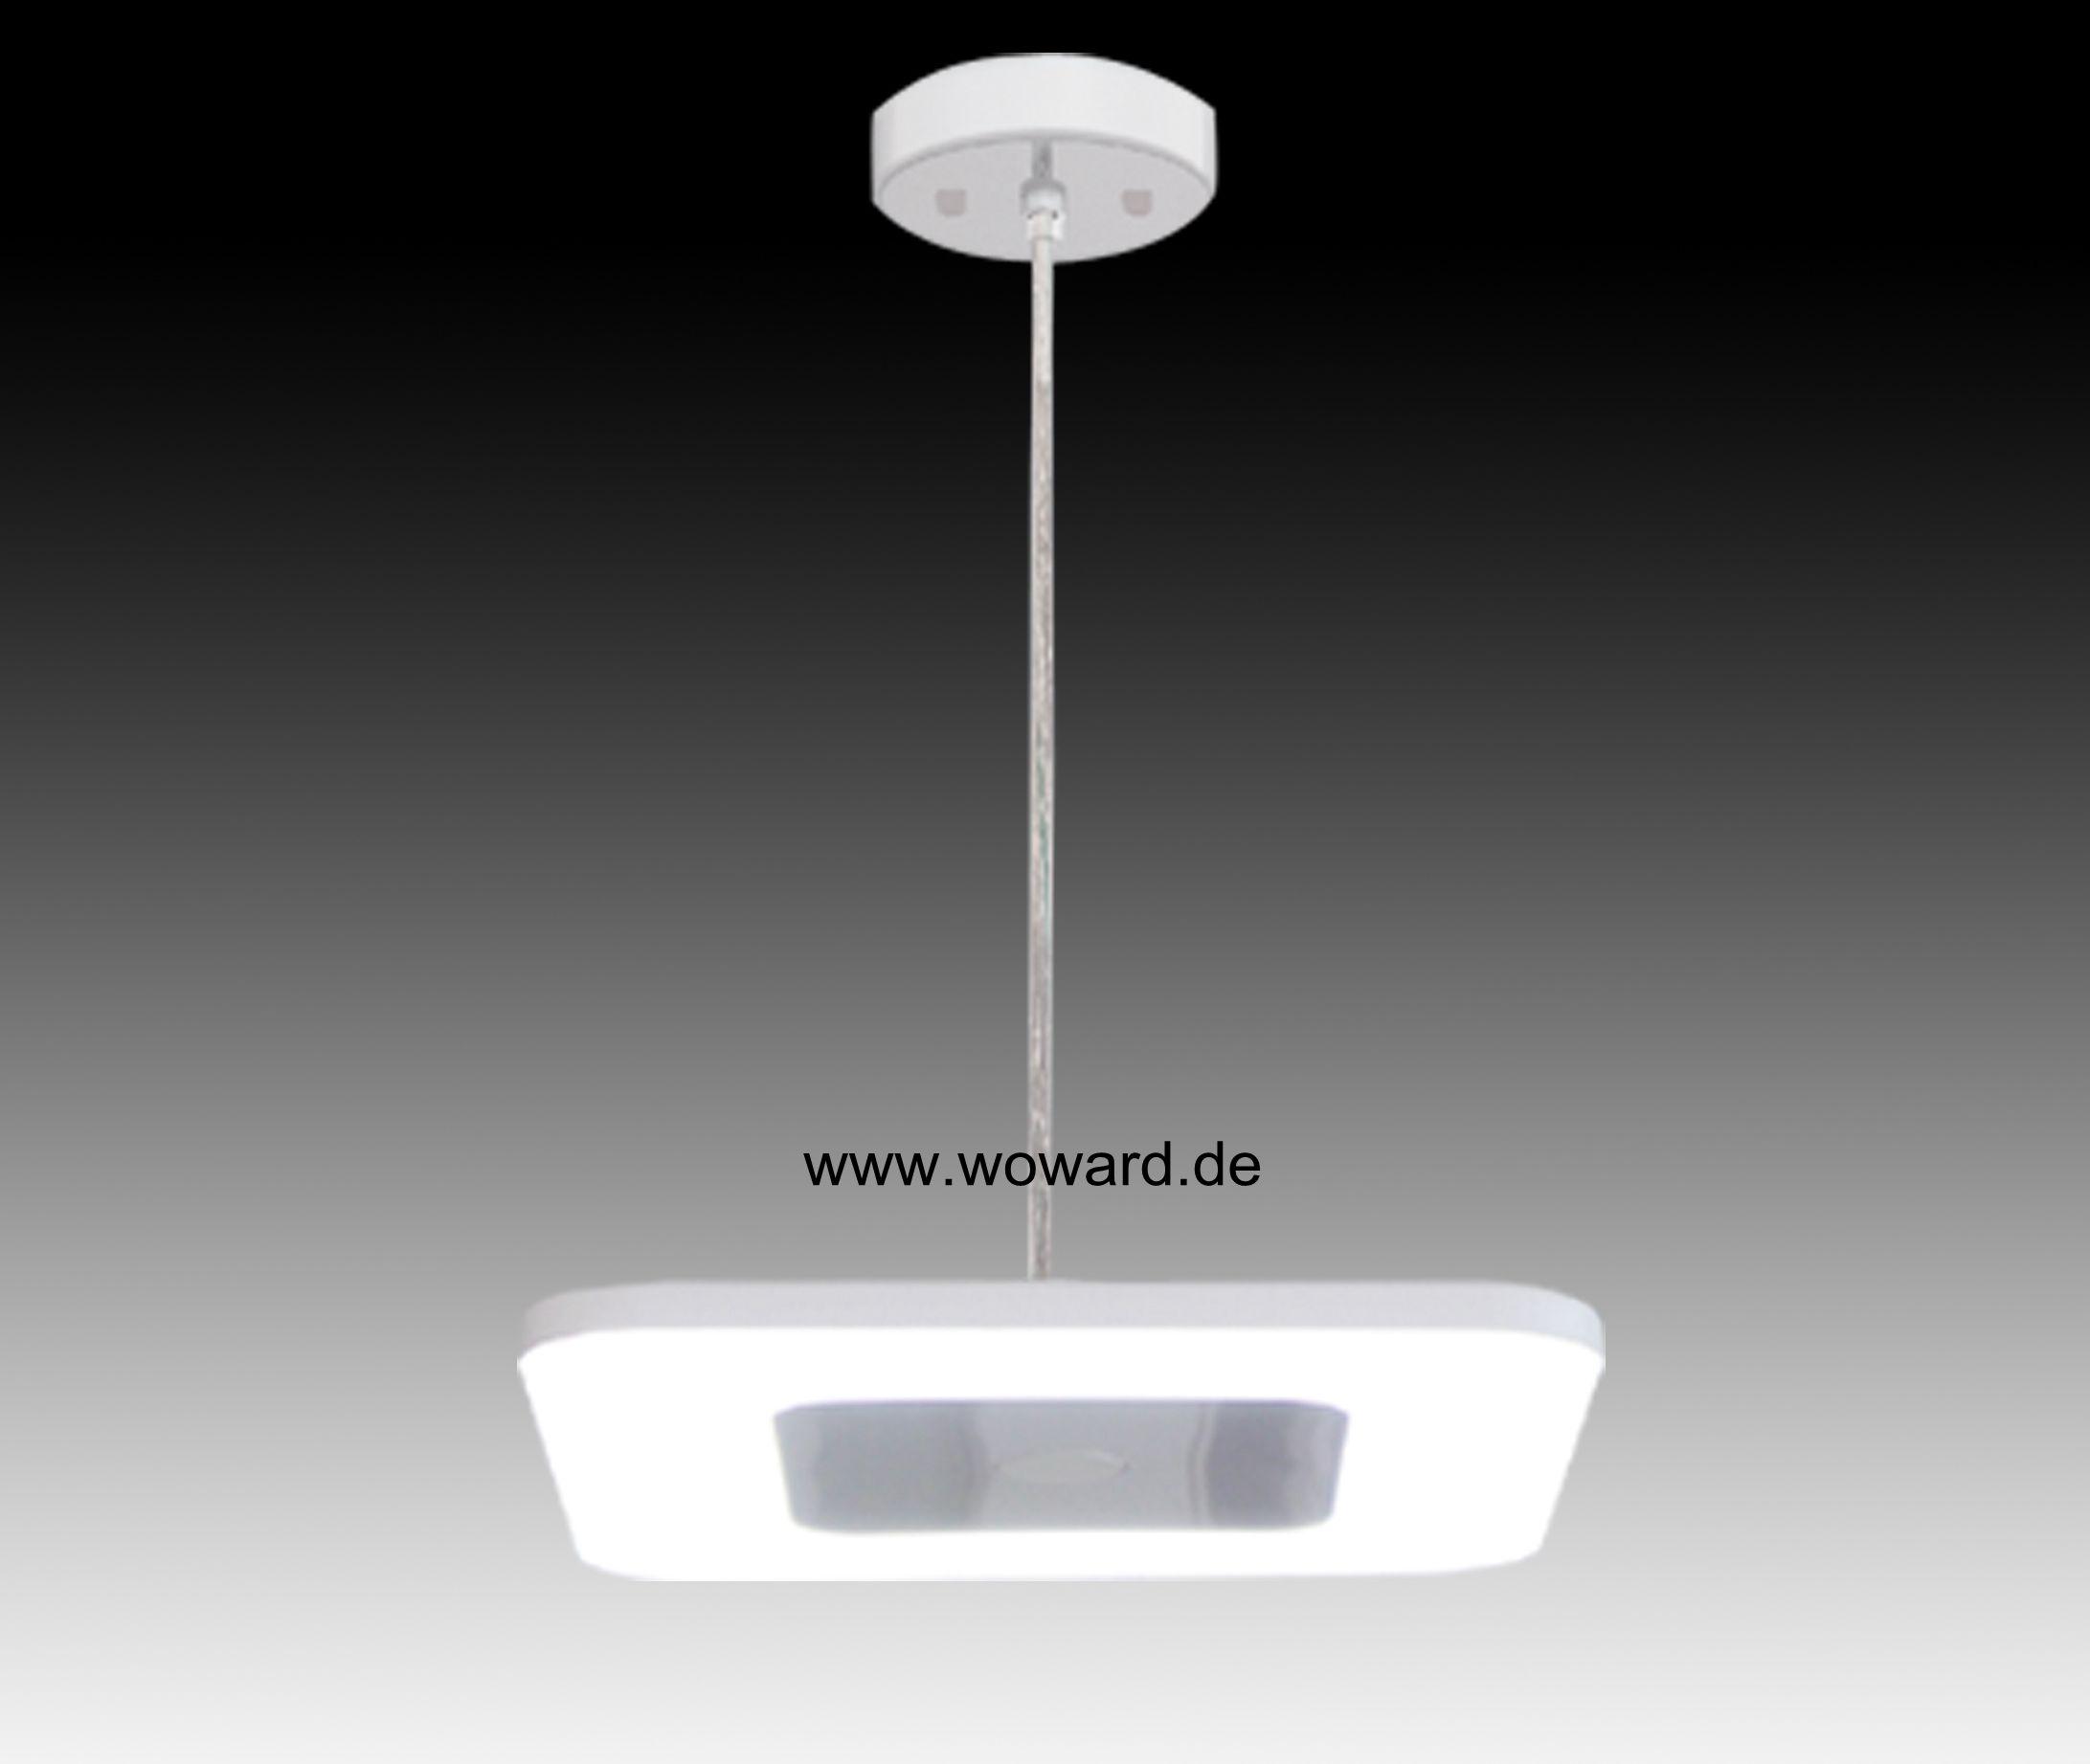 Led h nge 30w deckenlampe leuchte pendel decke lampe for Deckenlampe viereckig